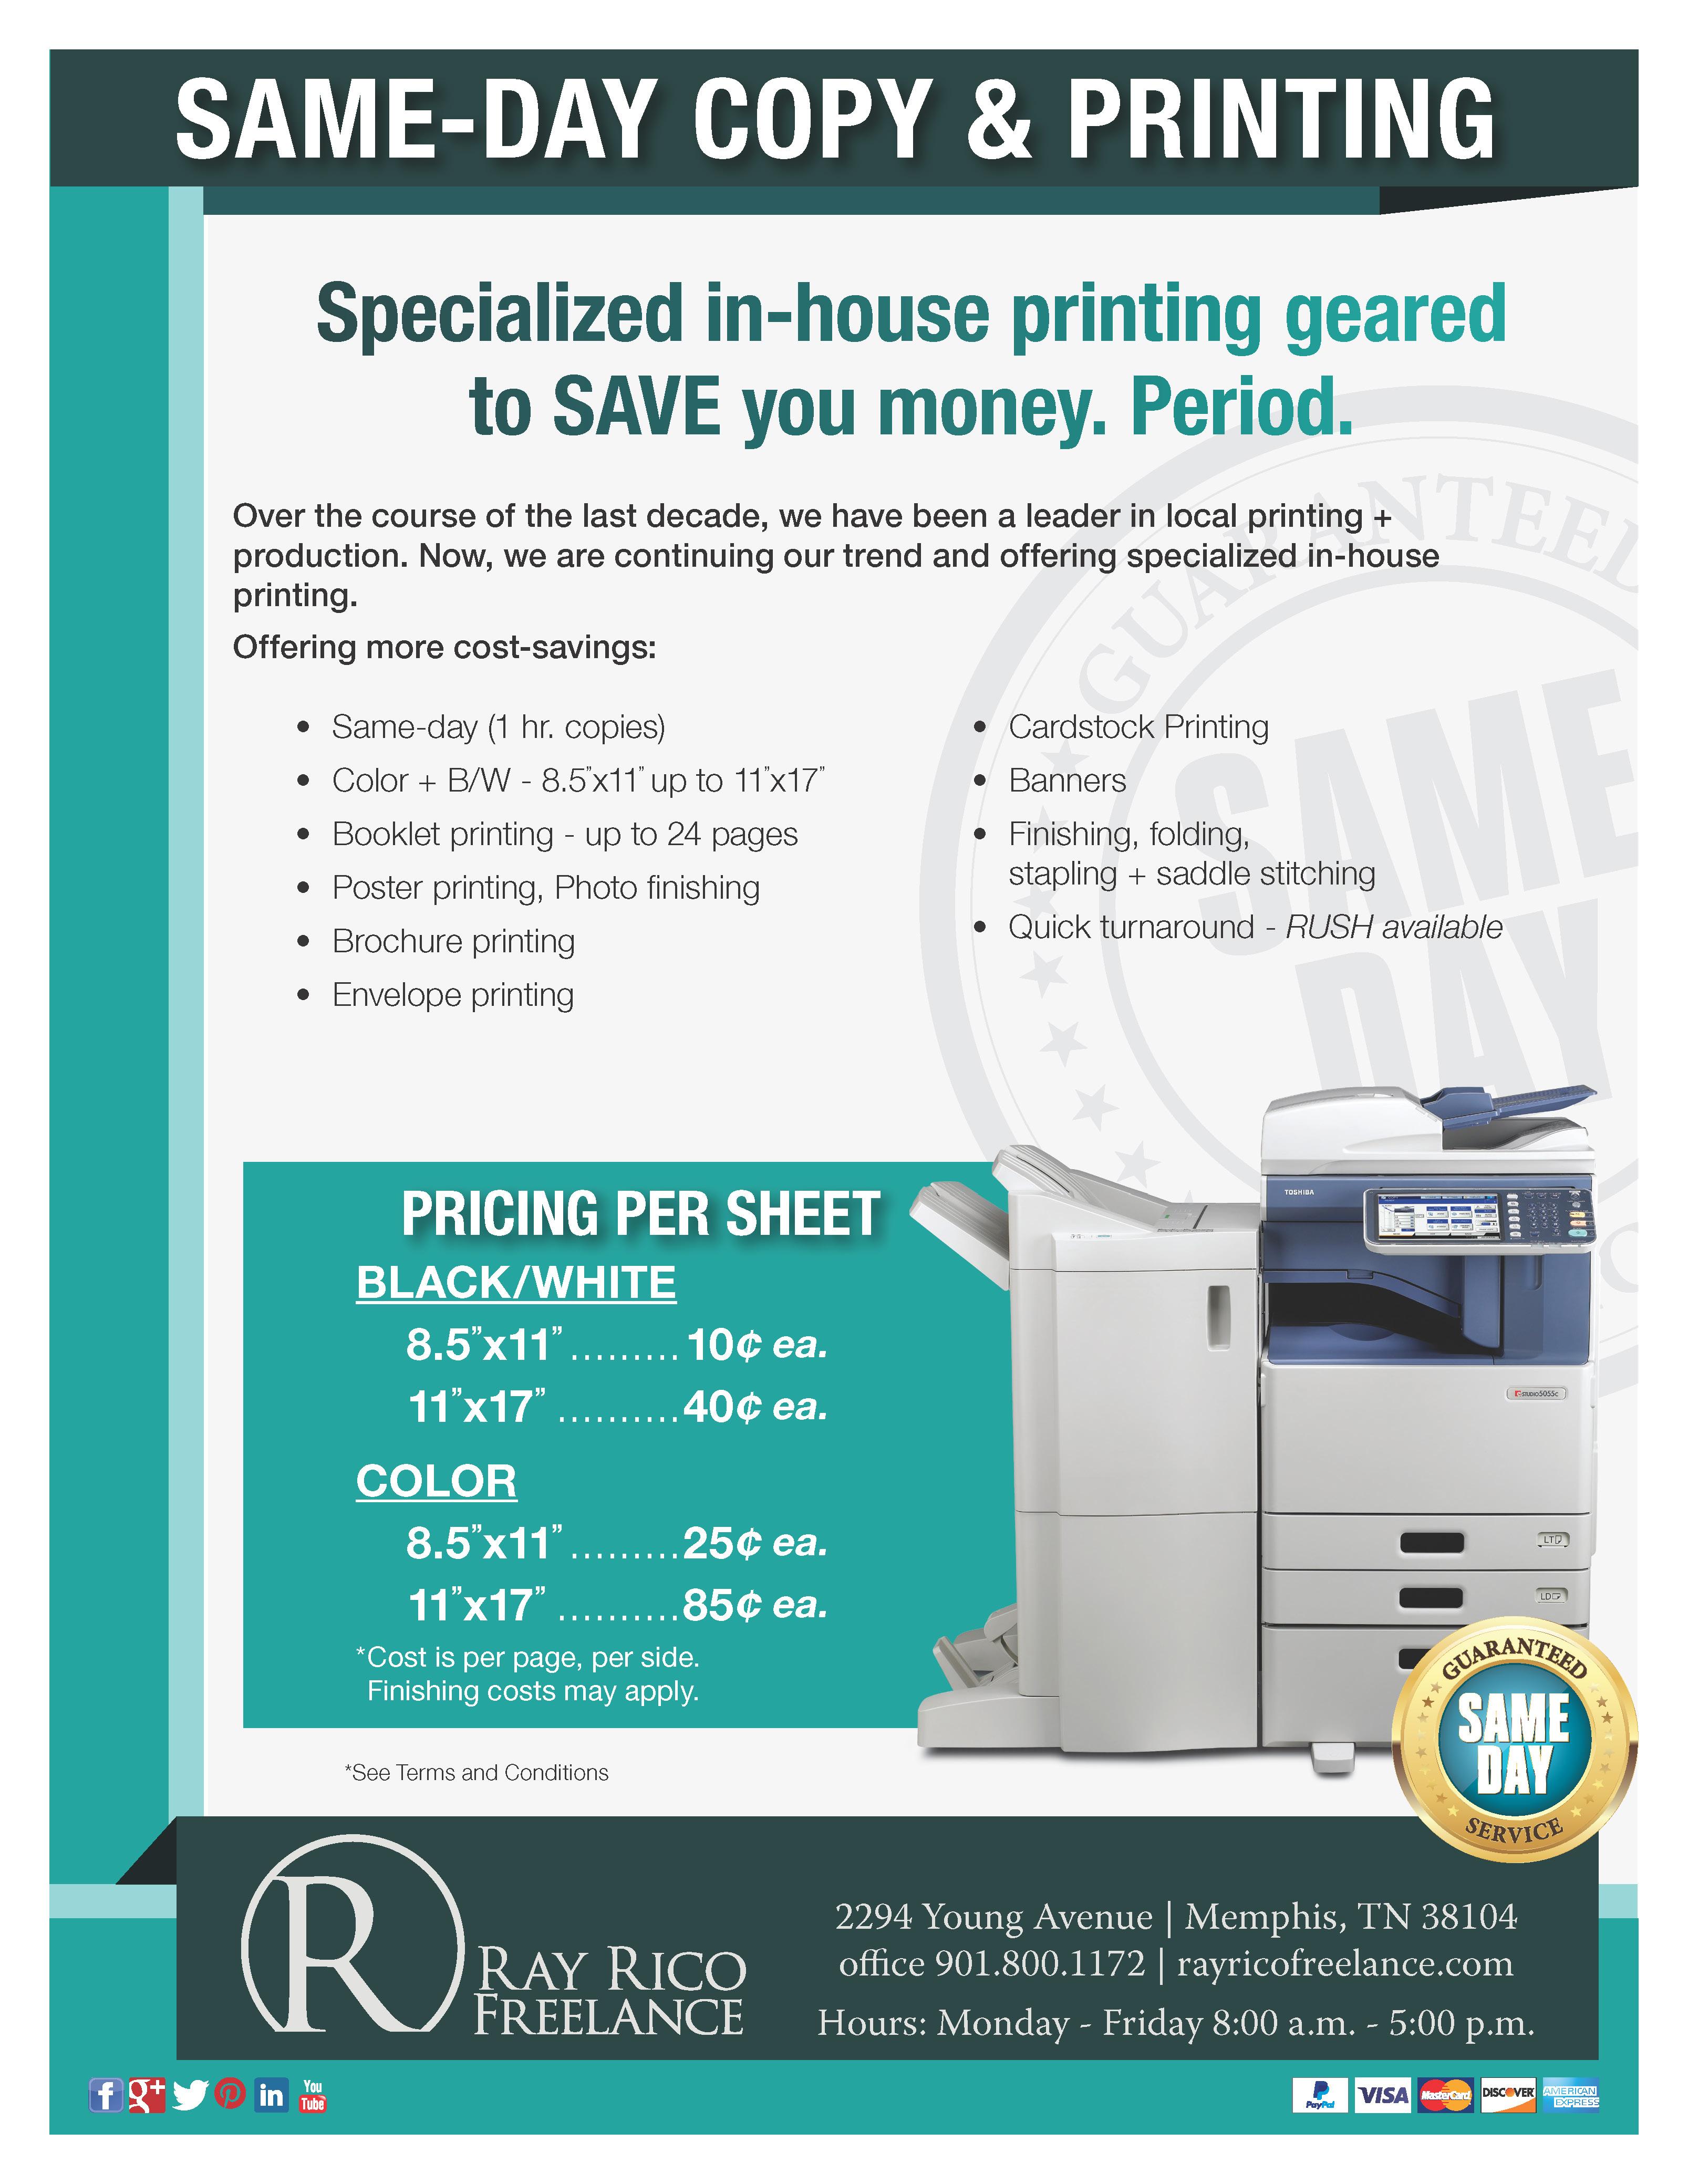 RRF16-2037 RRF Same Day Printing_proof 3 (1)_Page_1